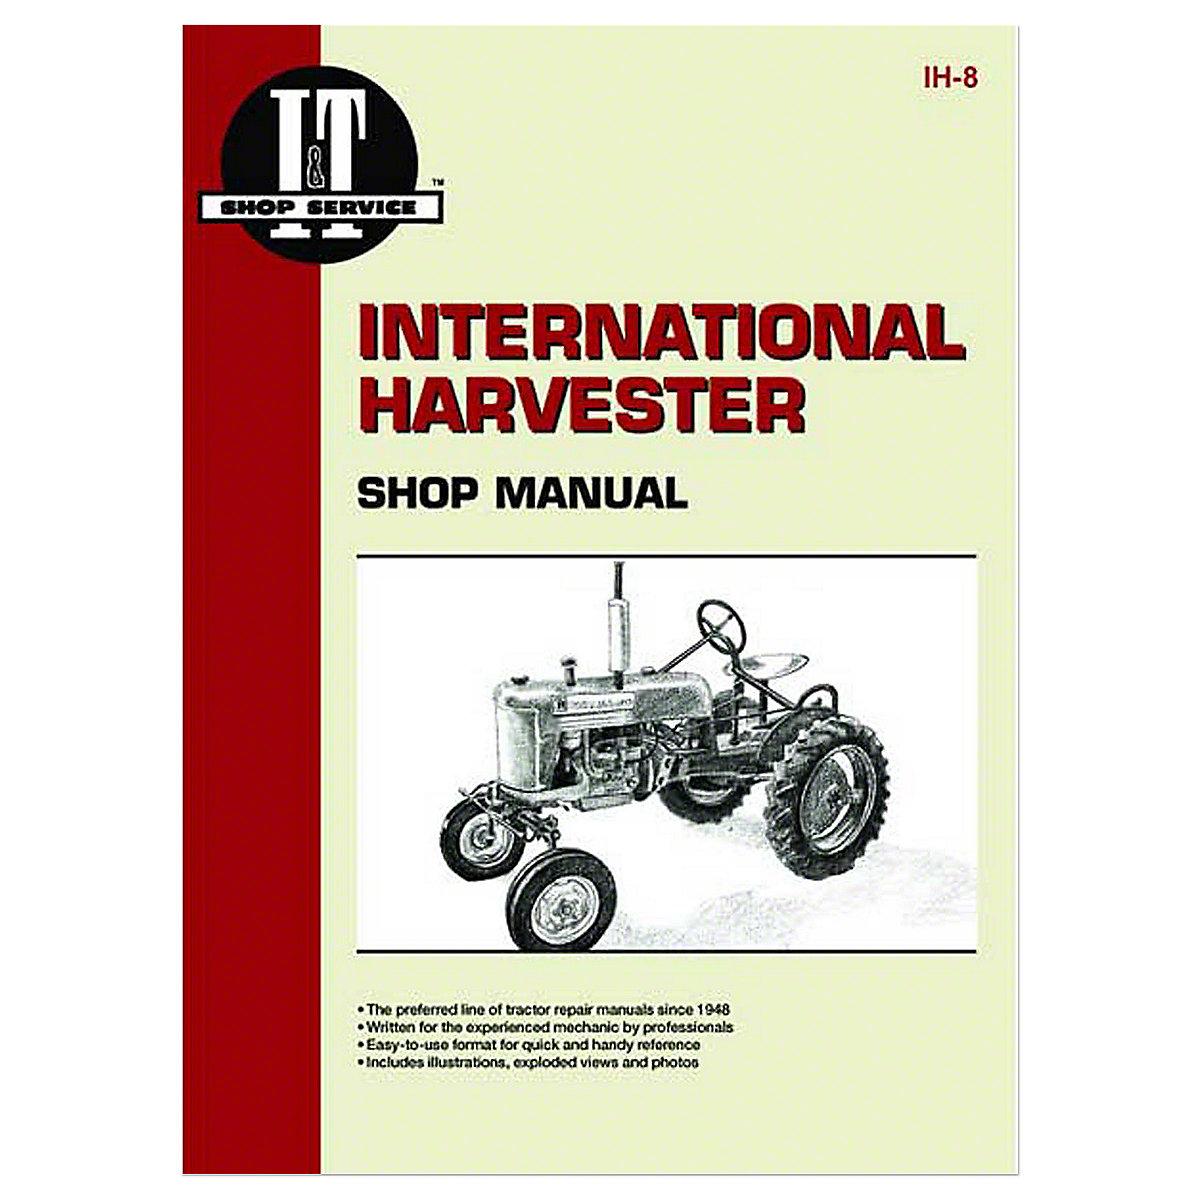 ih8 i t shop service manual rh steinertractor com International Harvester 354 Tractor 1972 354 International Tractor Parts